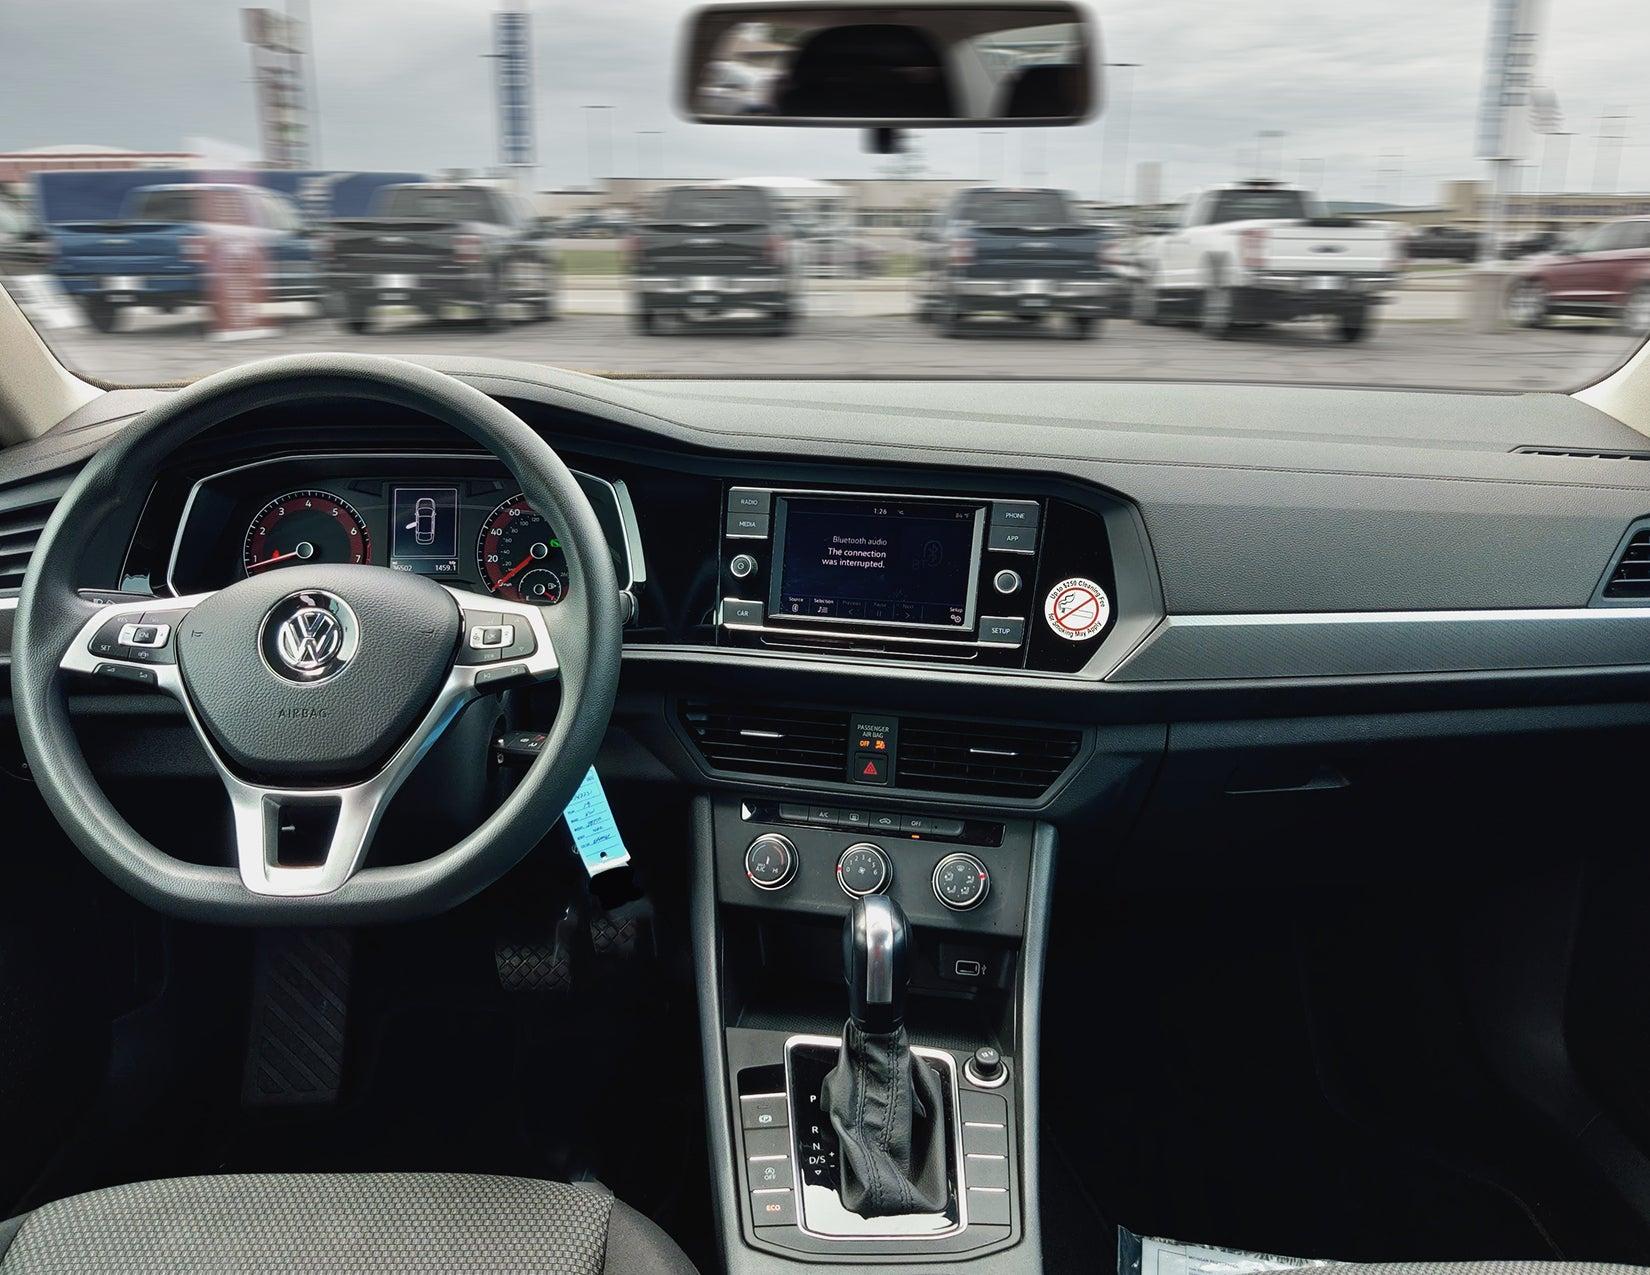 VW Jetta Interior Shot